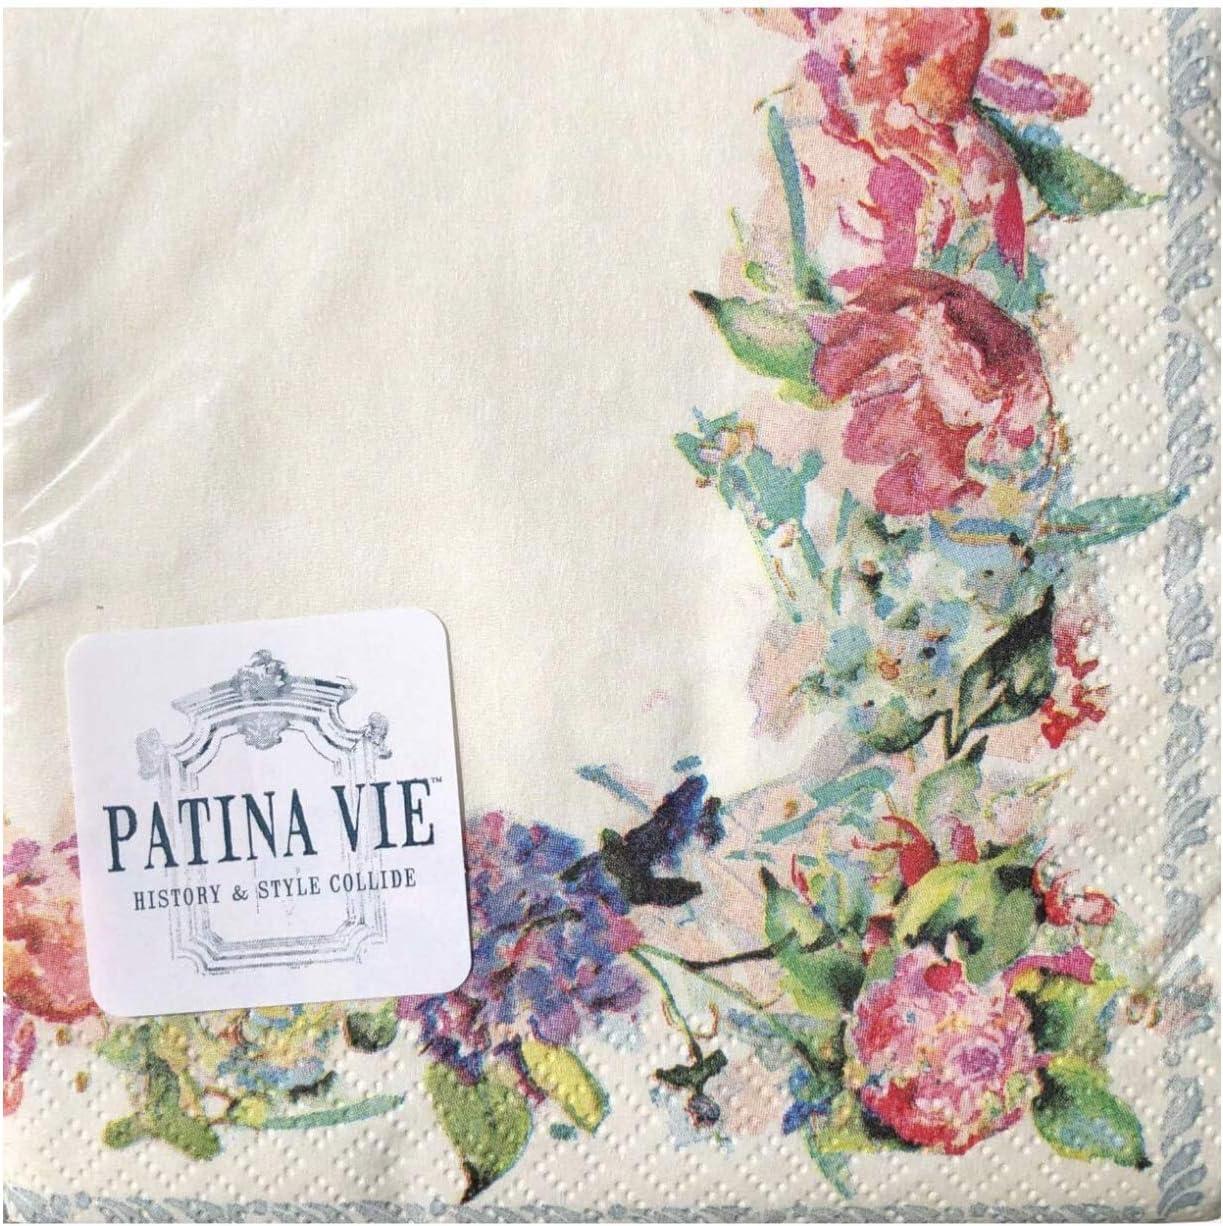 Patina Vie PV Floral Cream Paper Cocktail Beverage Napkins (0524), 36 ct